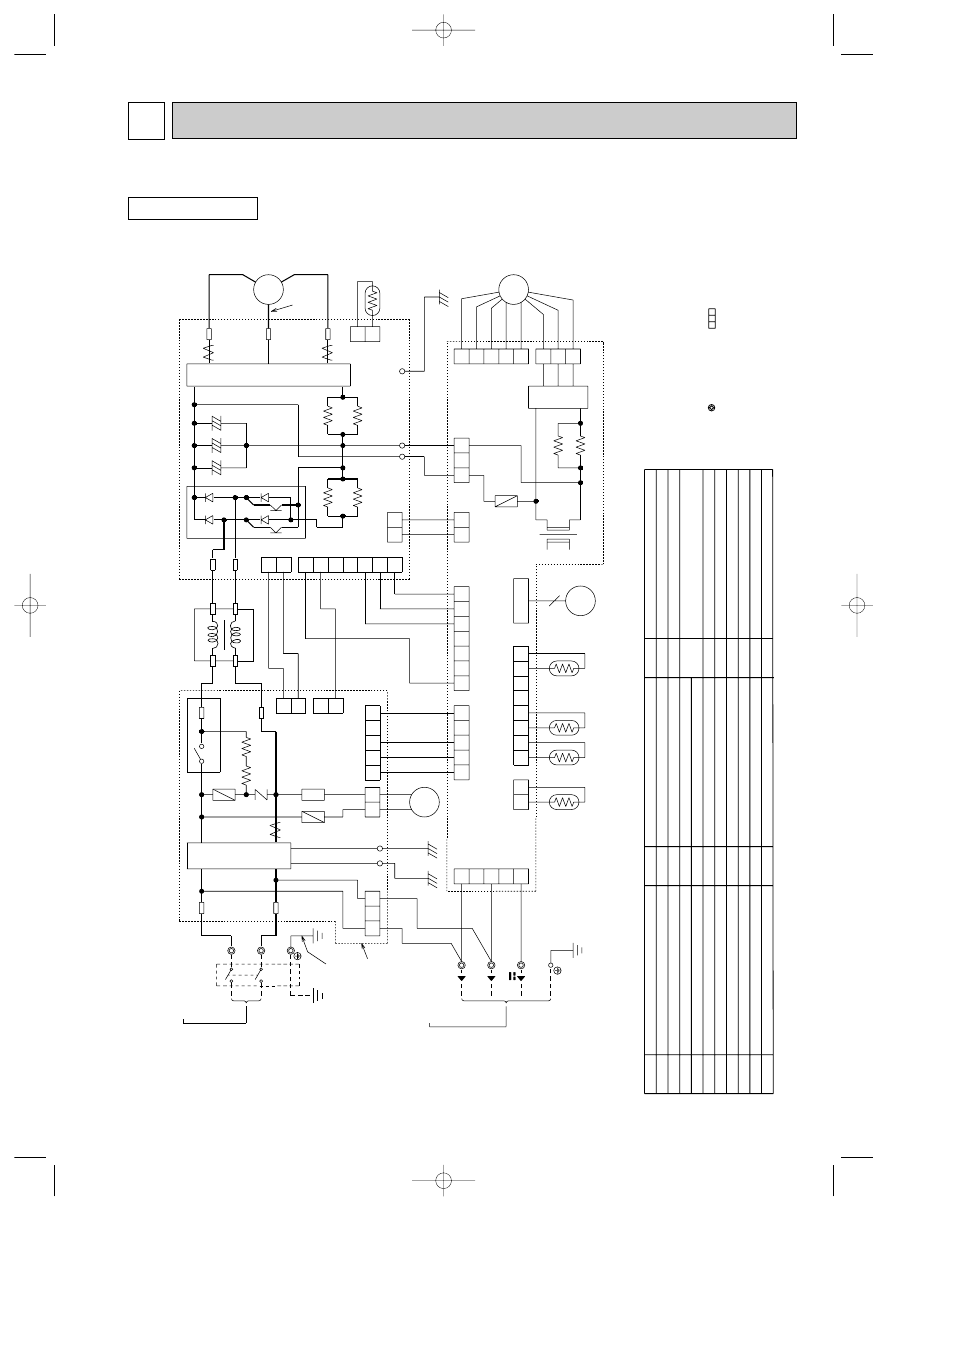 Mitsubishi Electric Wiring Diagram Electrical Diagrams 99 Mirage Fuse Box 6 Muz Gb50va 21s4 1995 Galant System